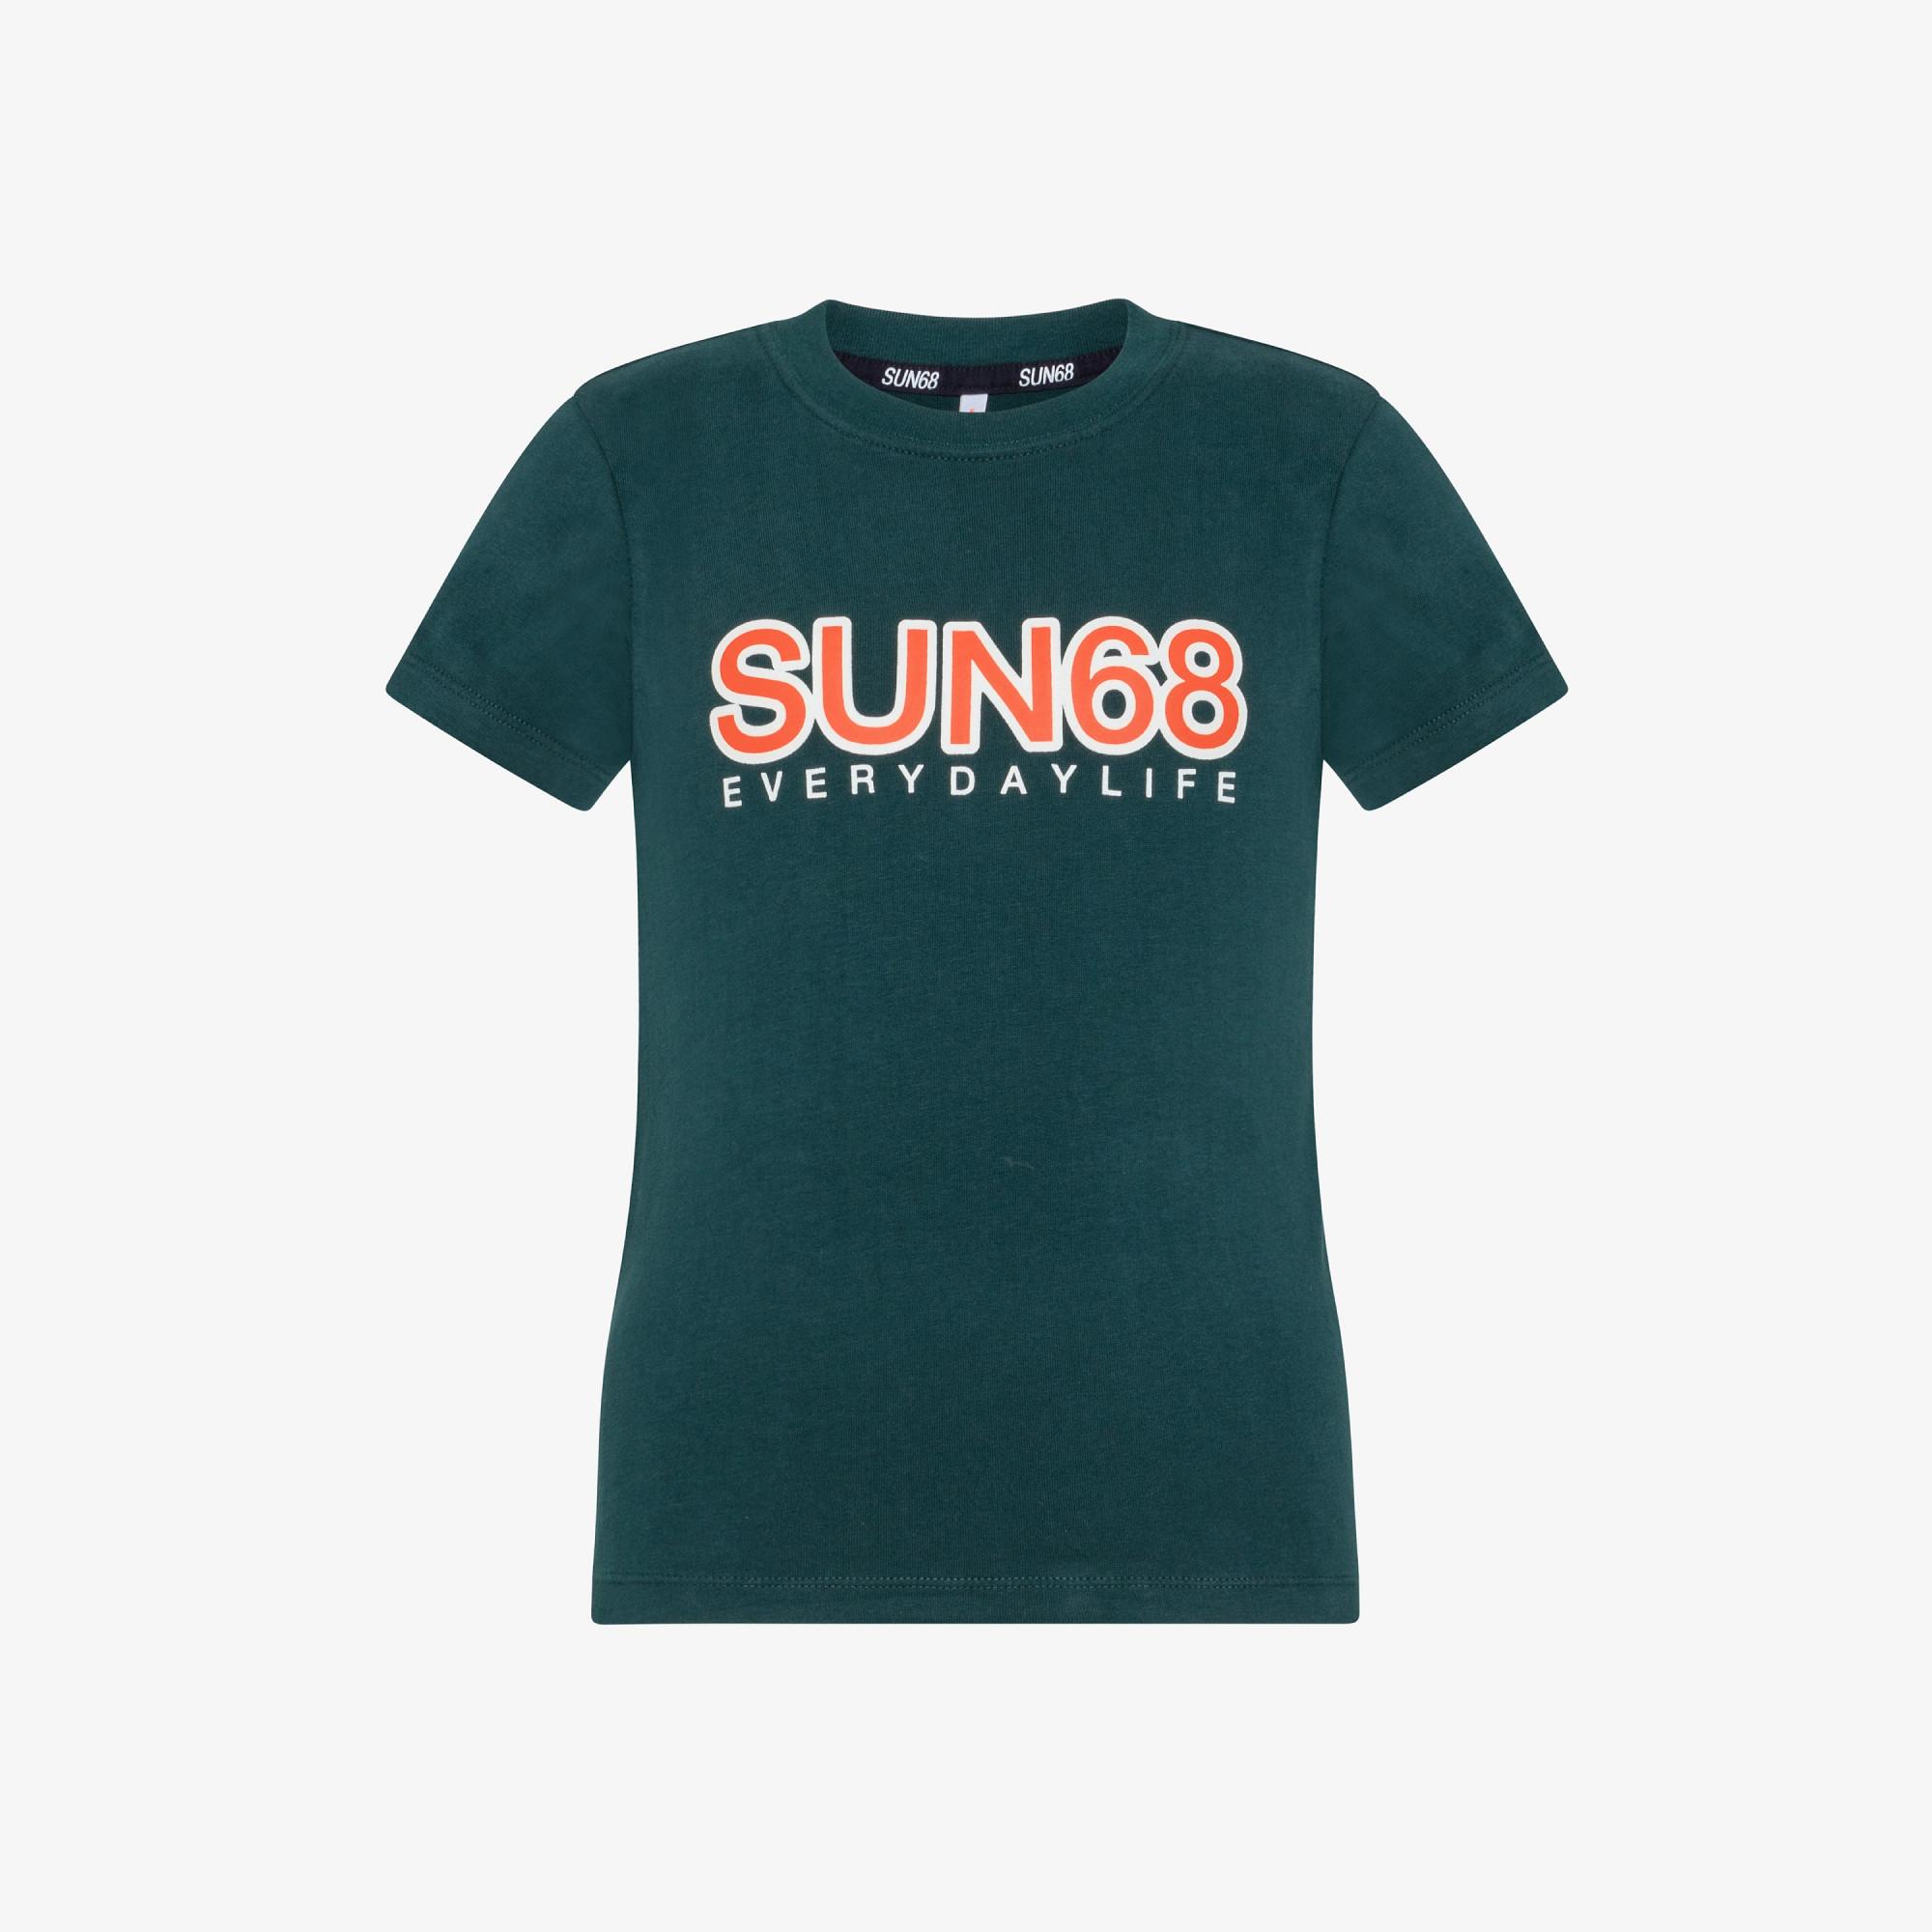 BOY'S ROUND T-SHIRT BIG LOGO S/S GREEN EMERALD